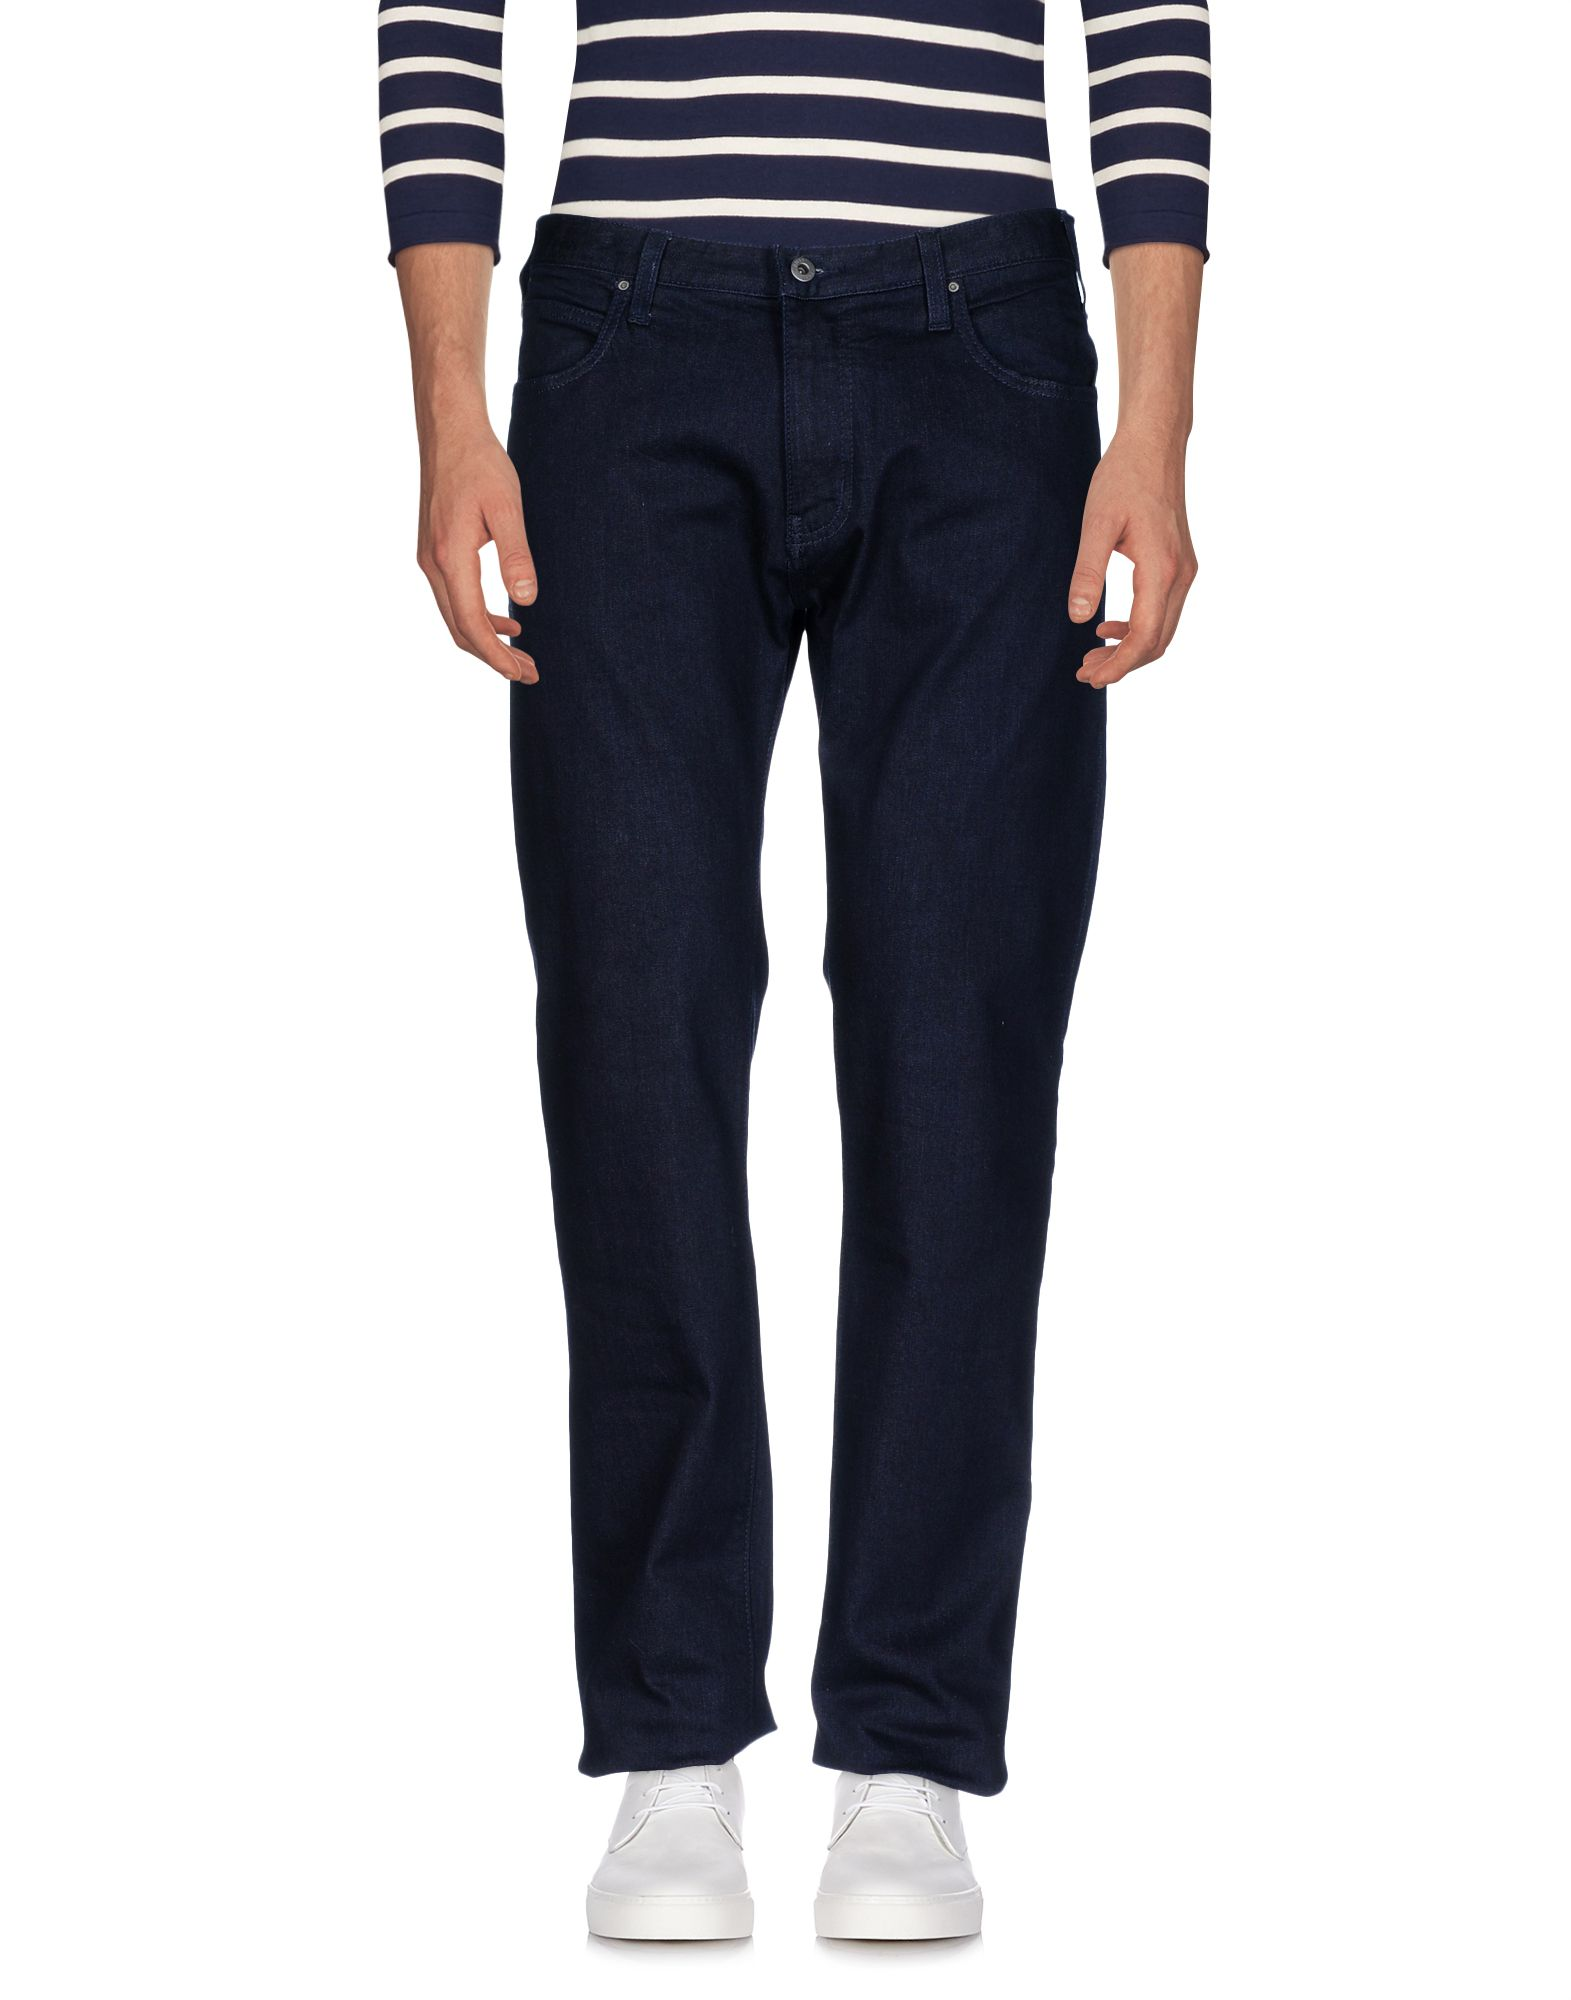 Pantaloni Jeans Armani Jeans Uomo - - Uomo 42648566XO d683ad